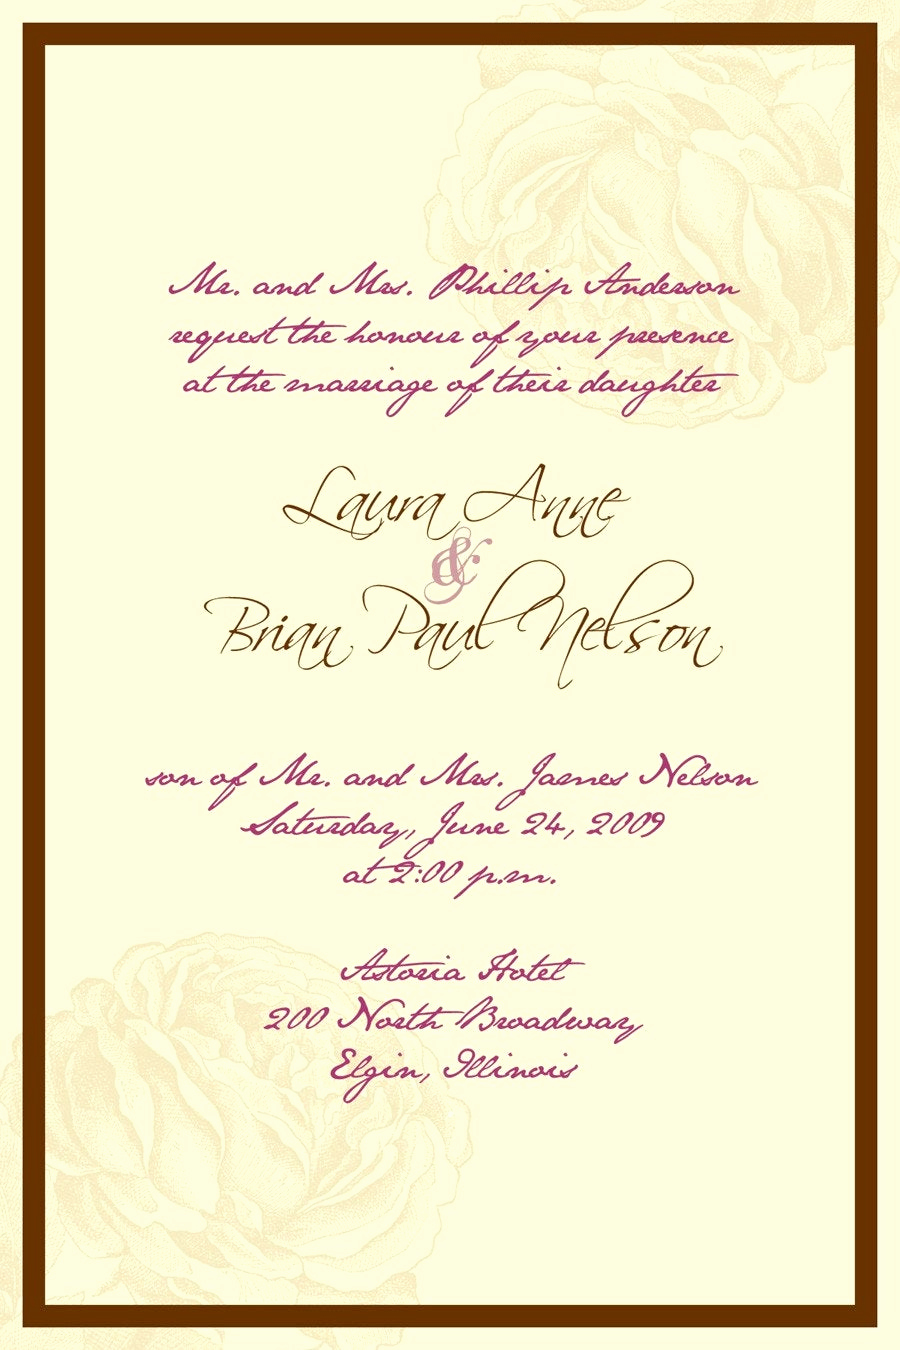 Wedding Invitation Details Card Wording Fresh Kerala Wedding Invitation Cards Samples